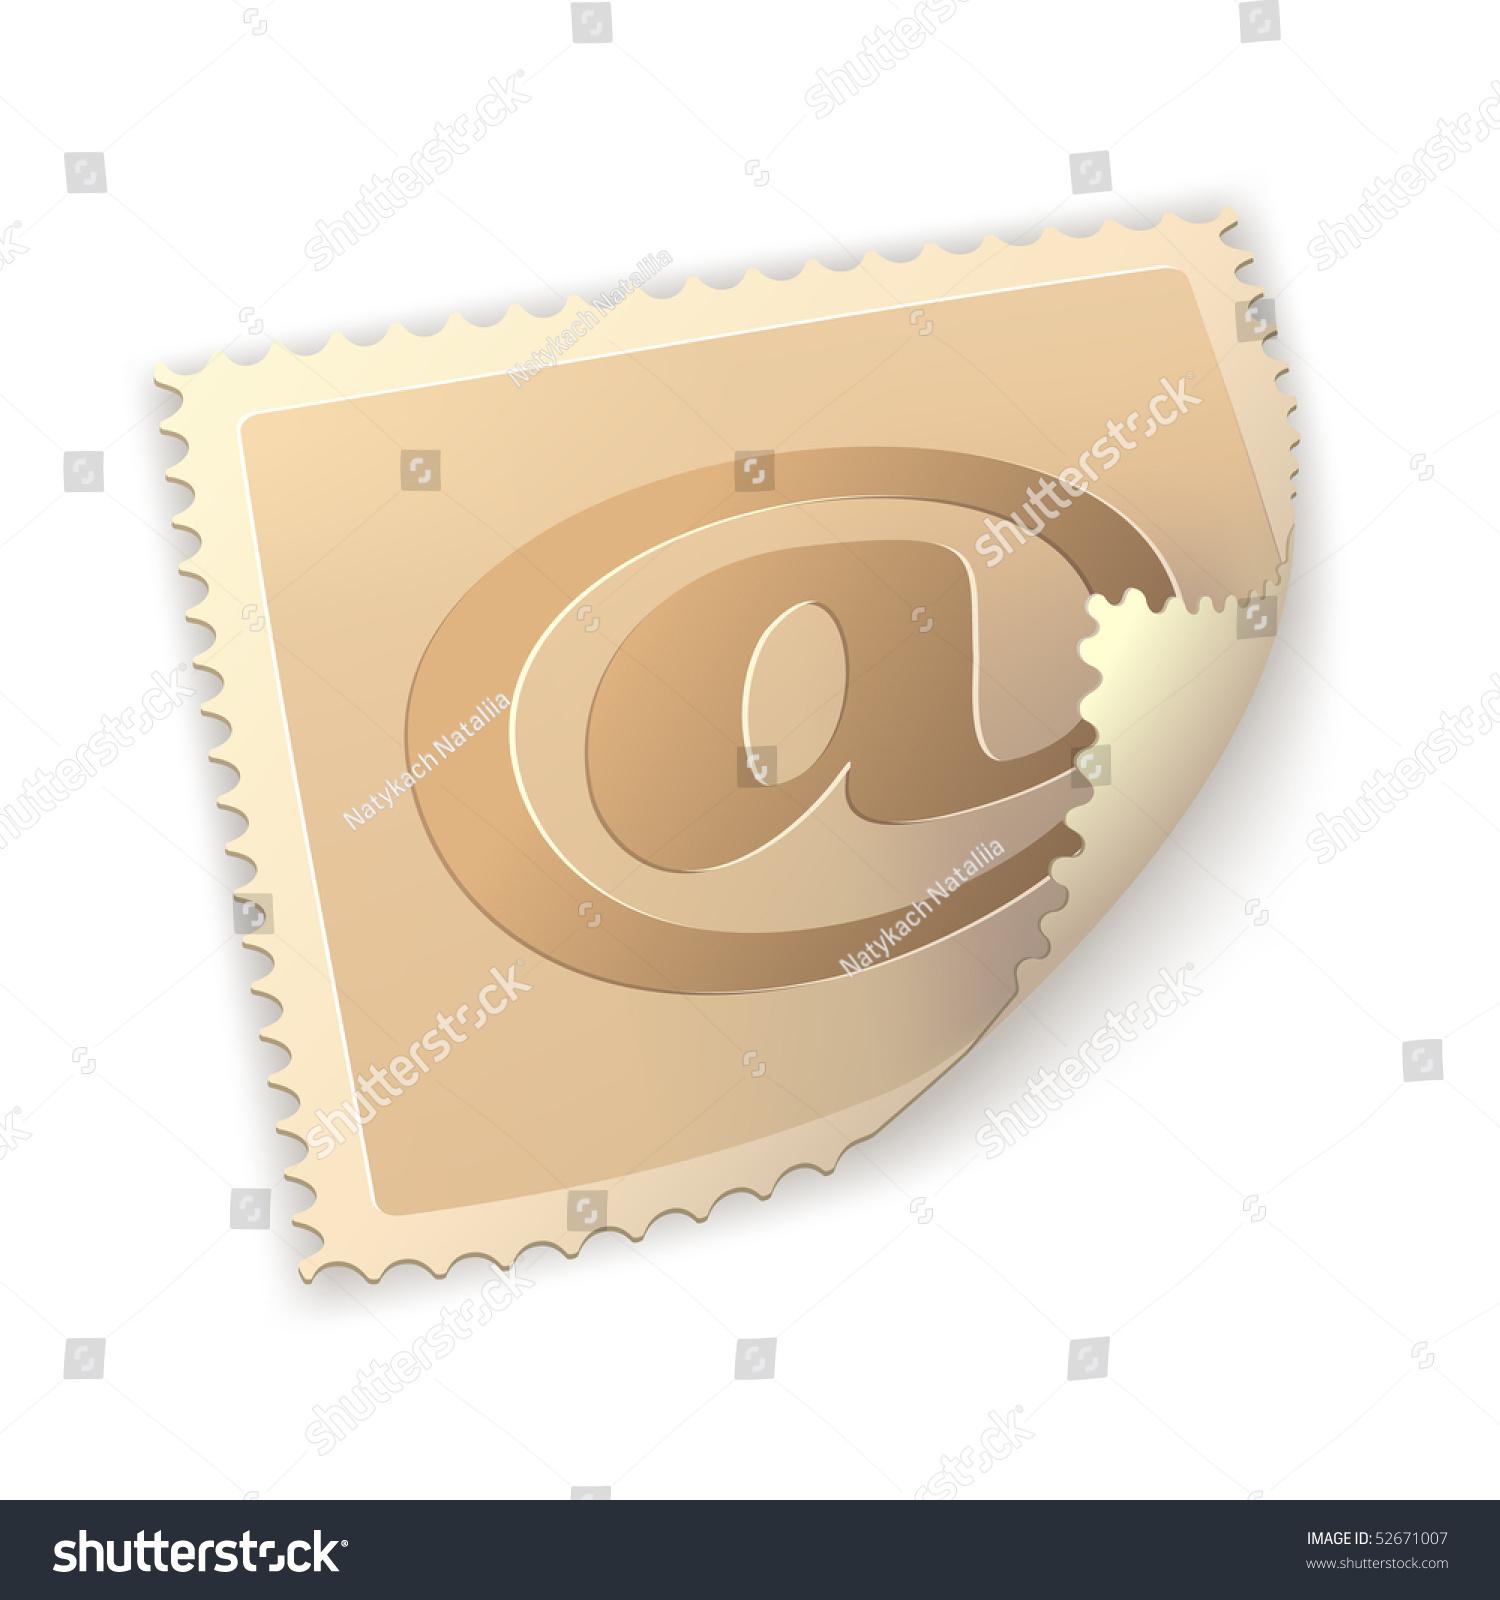 Postage Stamp, Vector - 52671007 : Shutterstock